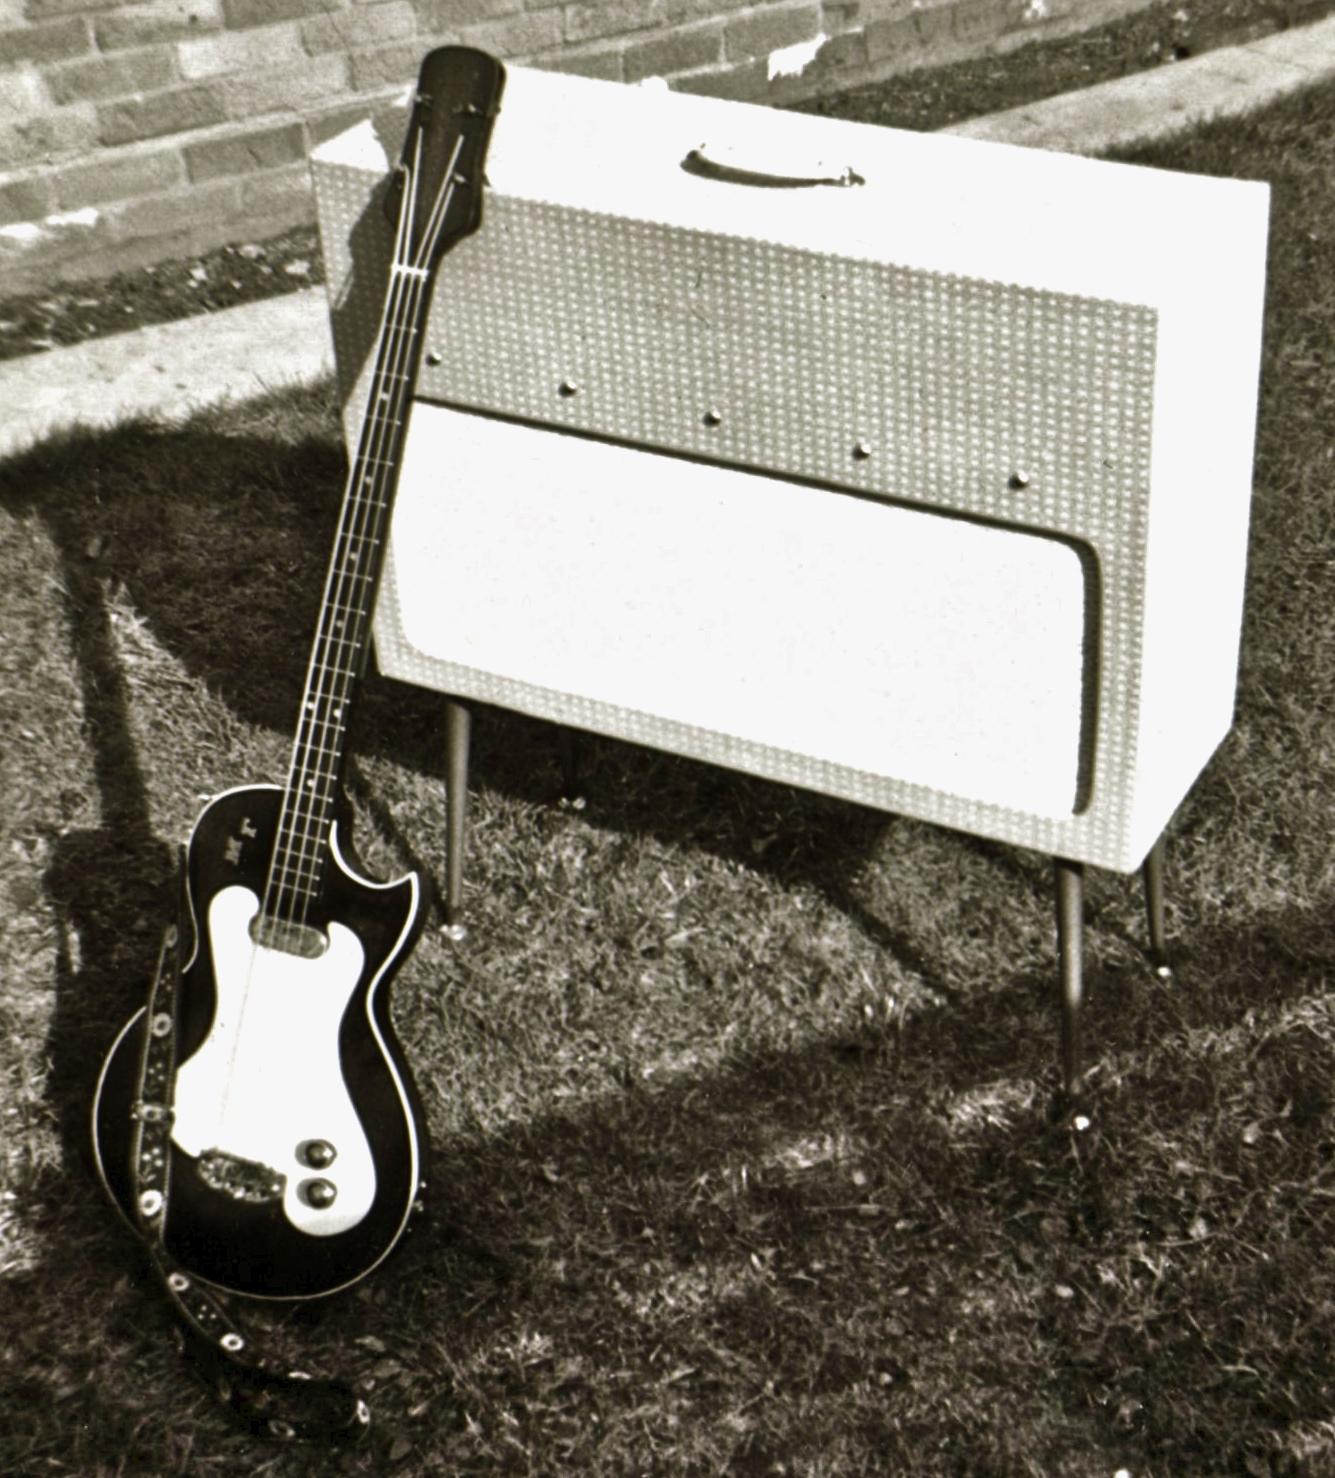 Mo's first tuxedo-amp-690